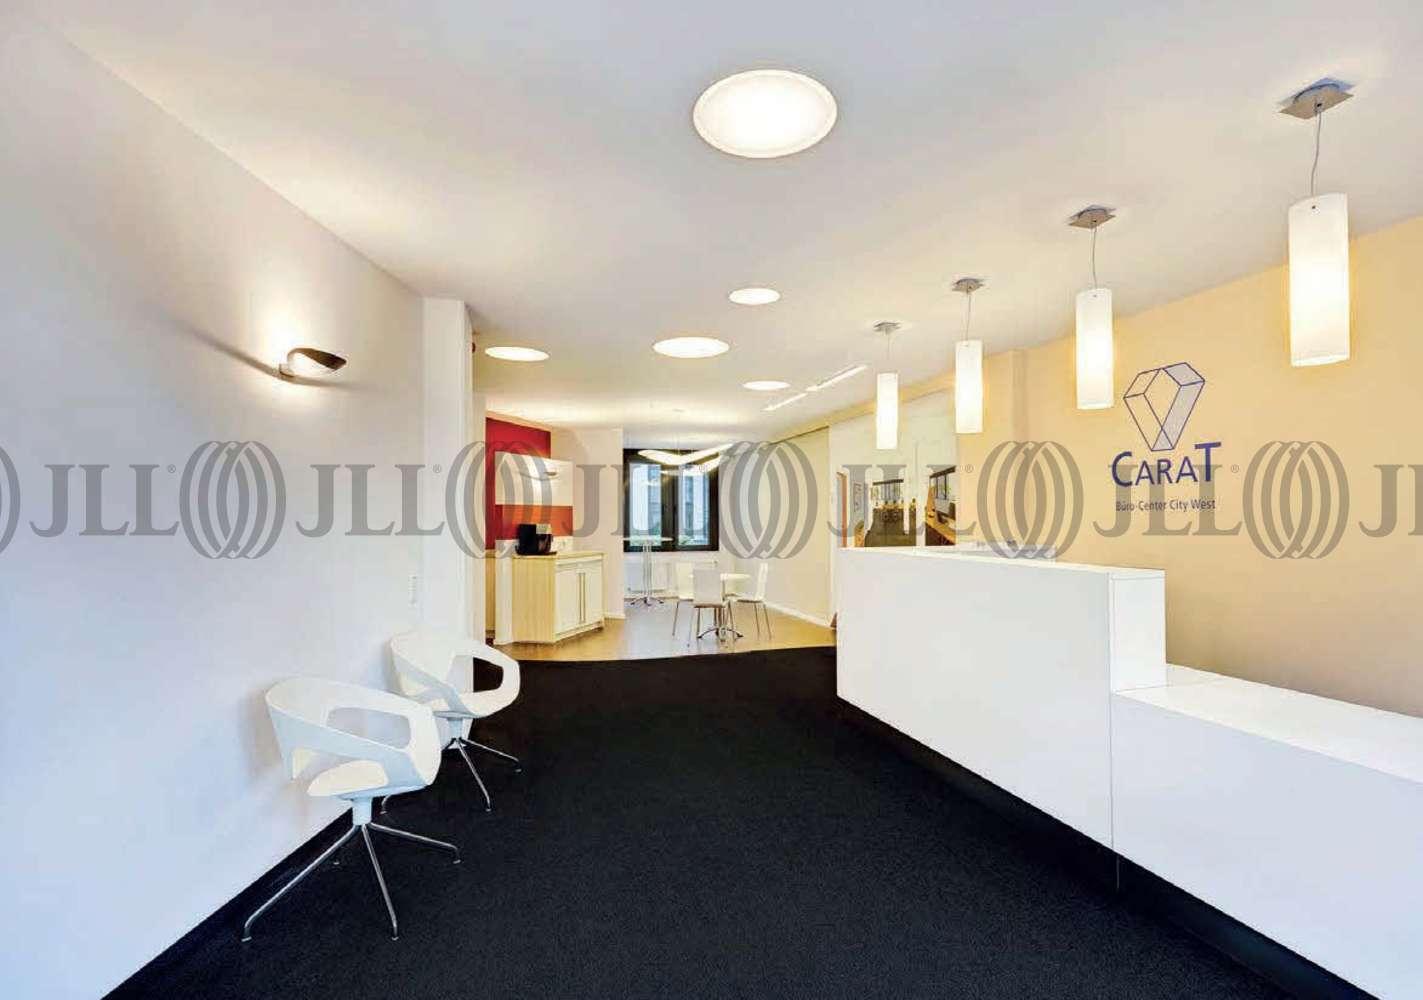 Büros Frankfurt am main, 60486 - Büro - Frankfurt am Main, Bockenheim - F0943 - 10443005